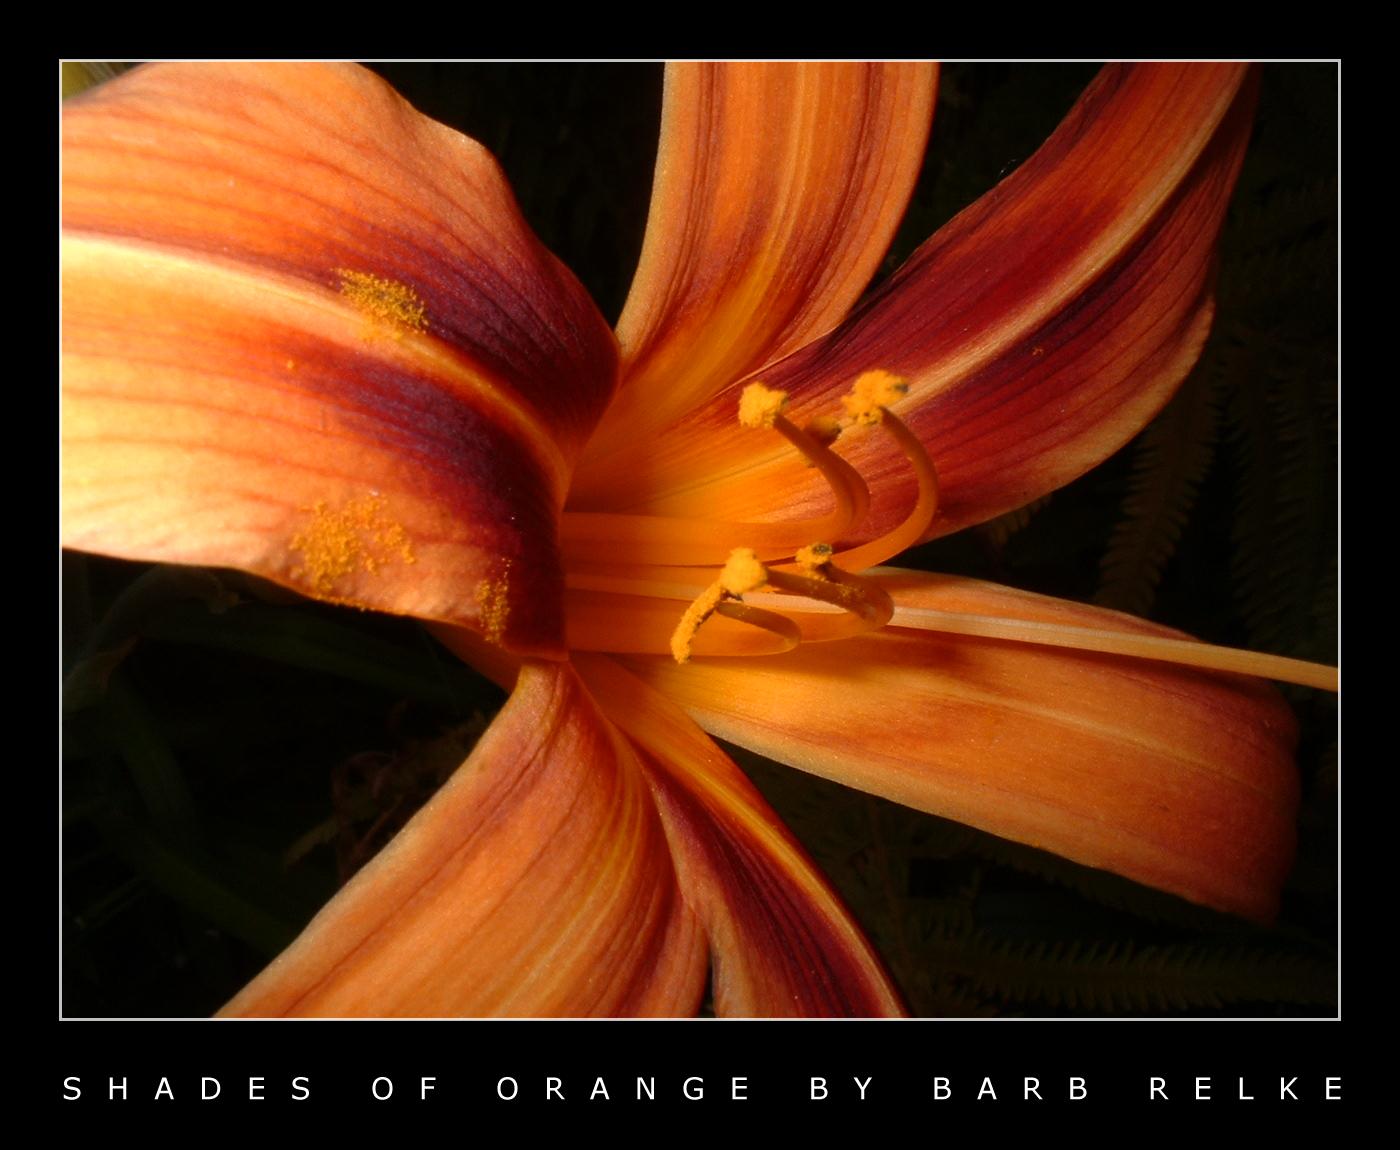 Shades of Orange - A Lily by redbandana